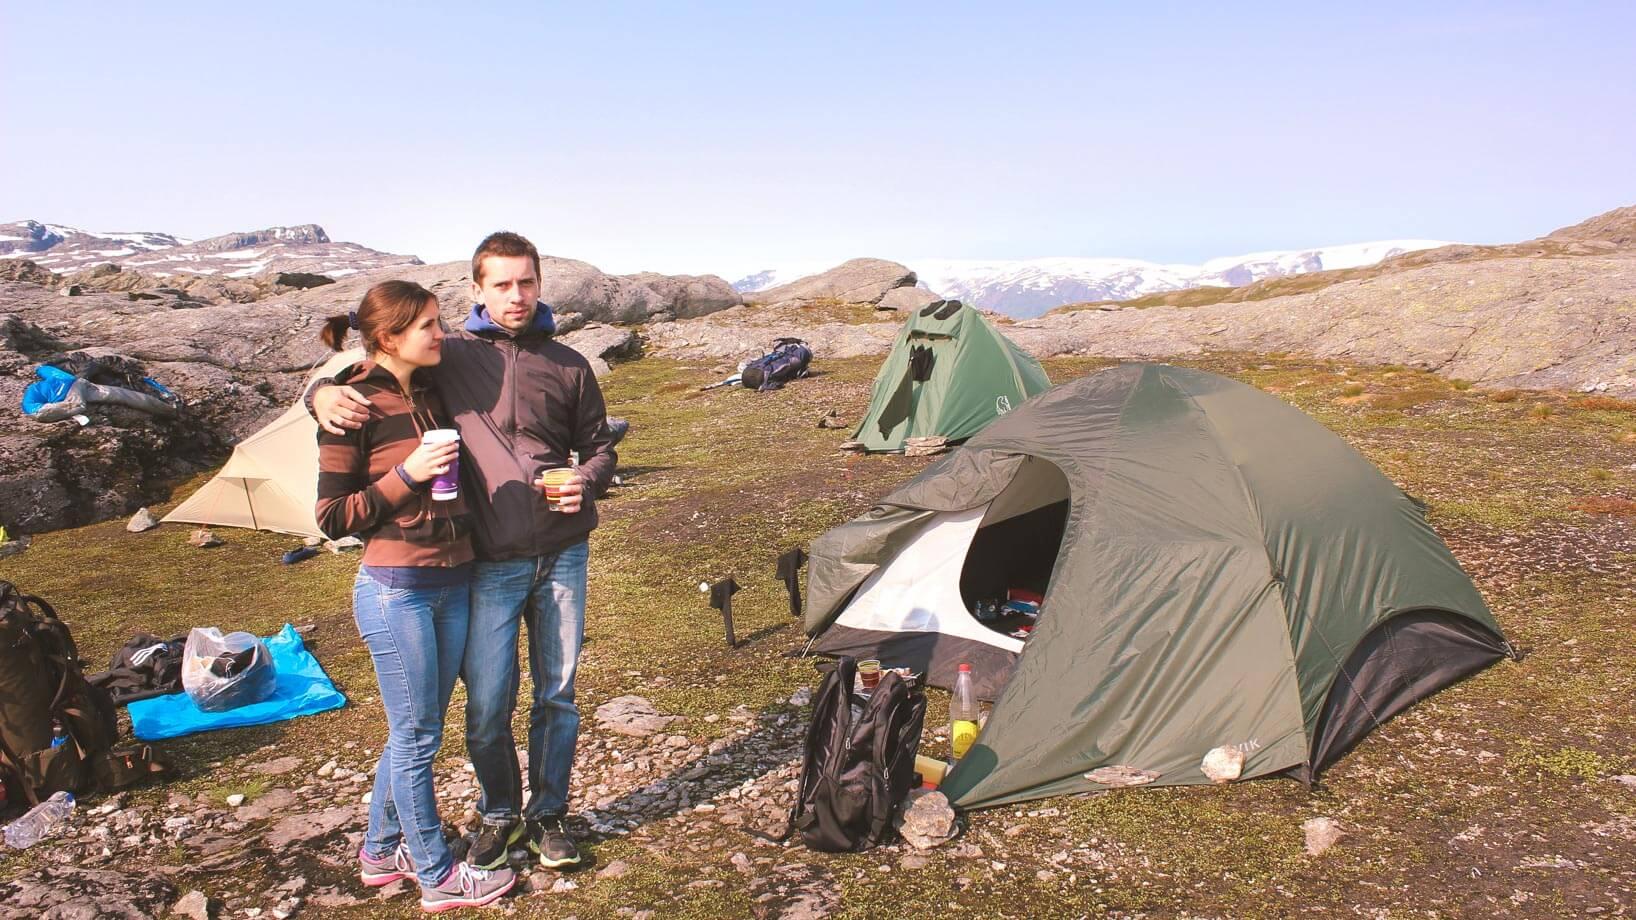 Trolltunga Hike Guide - Trolltunga camping overnight